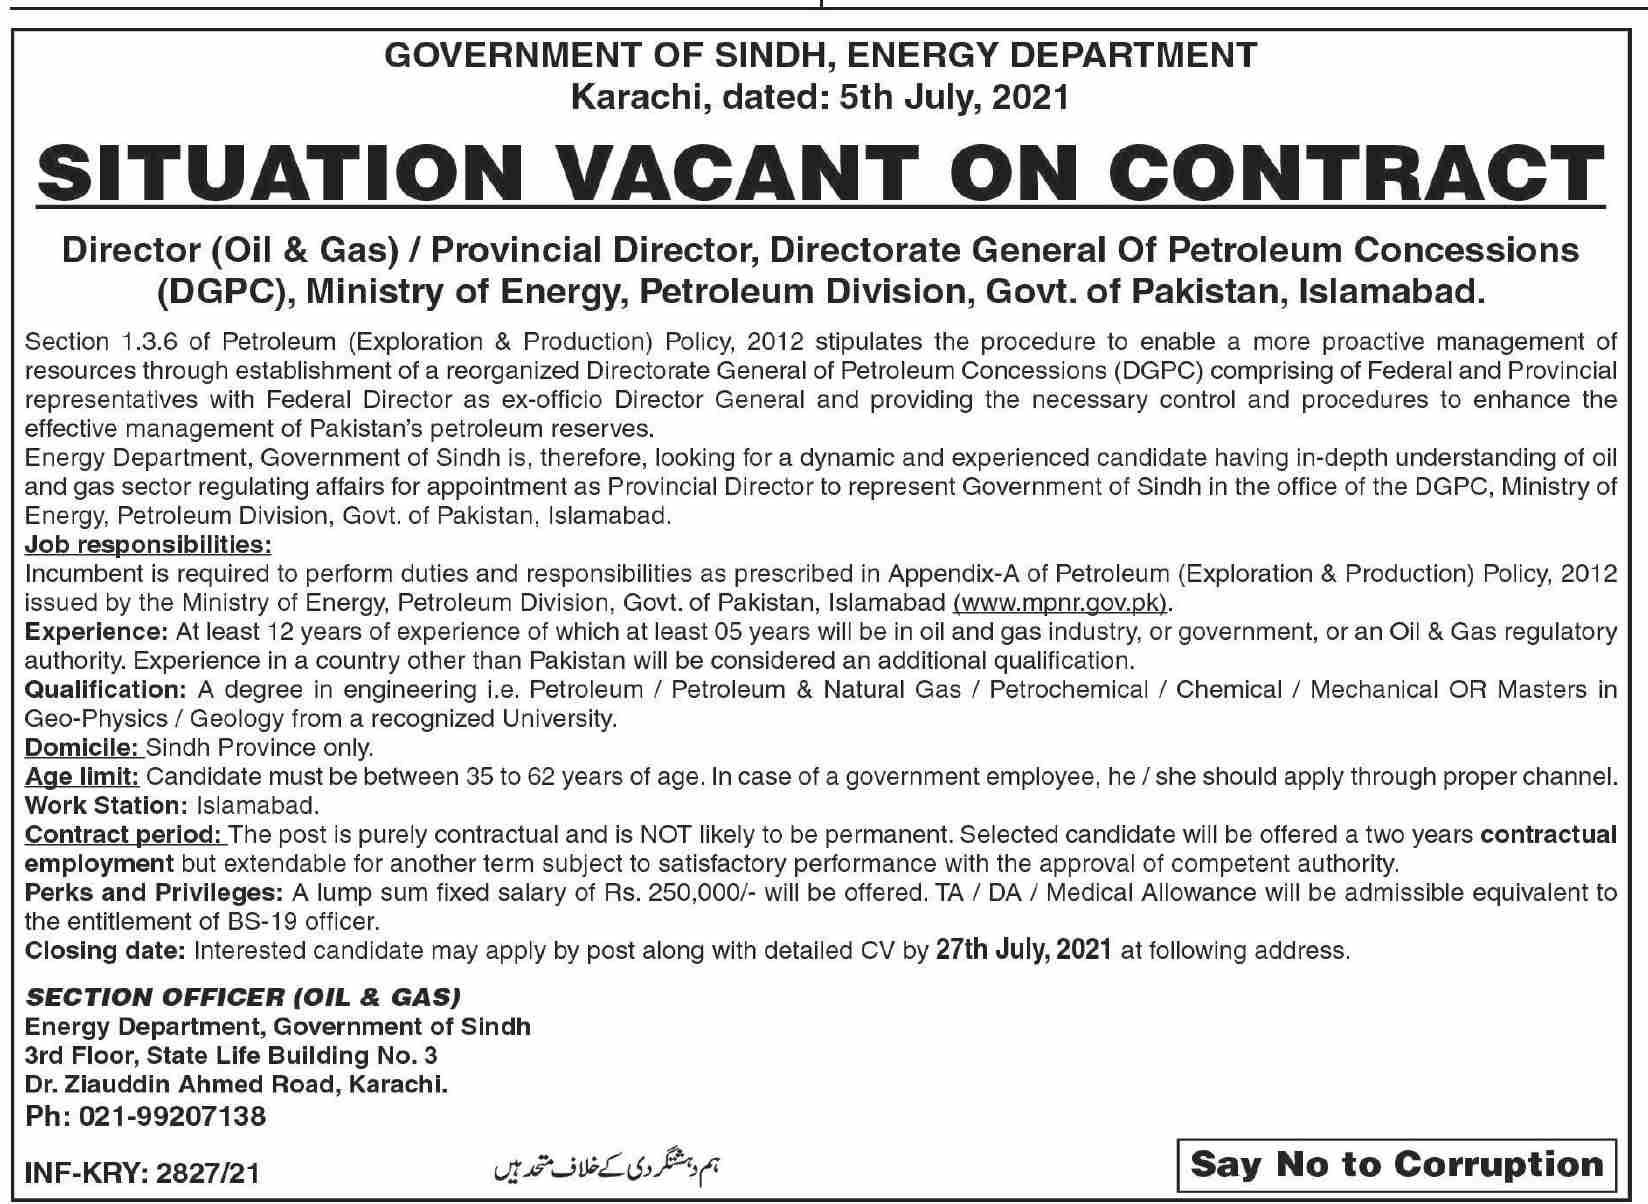 www.mpnr.gov.pk Jobs 2021 - Energy Department Sindh Jobs 2021 in Pakistan